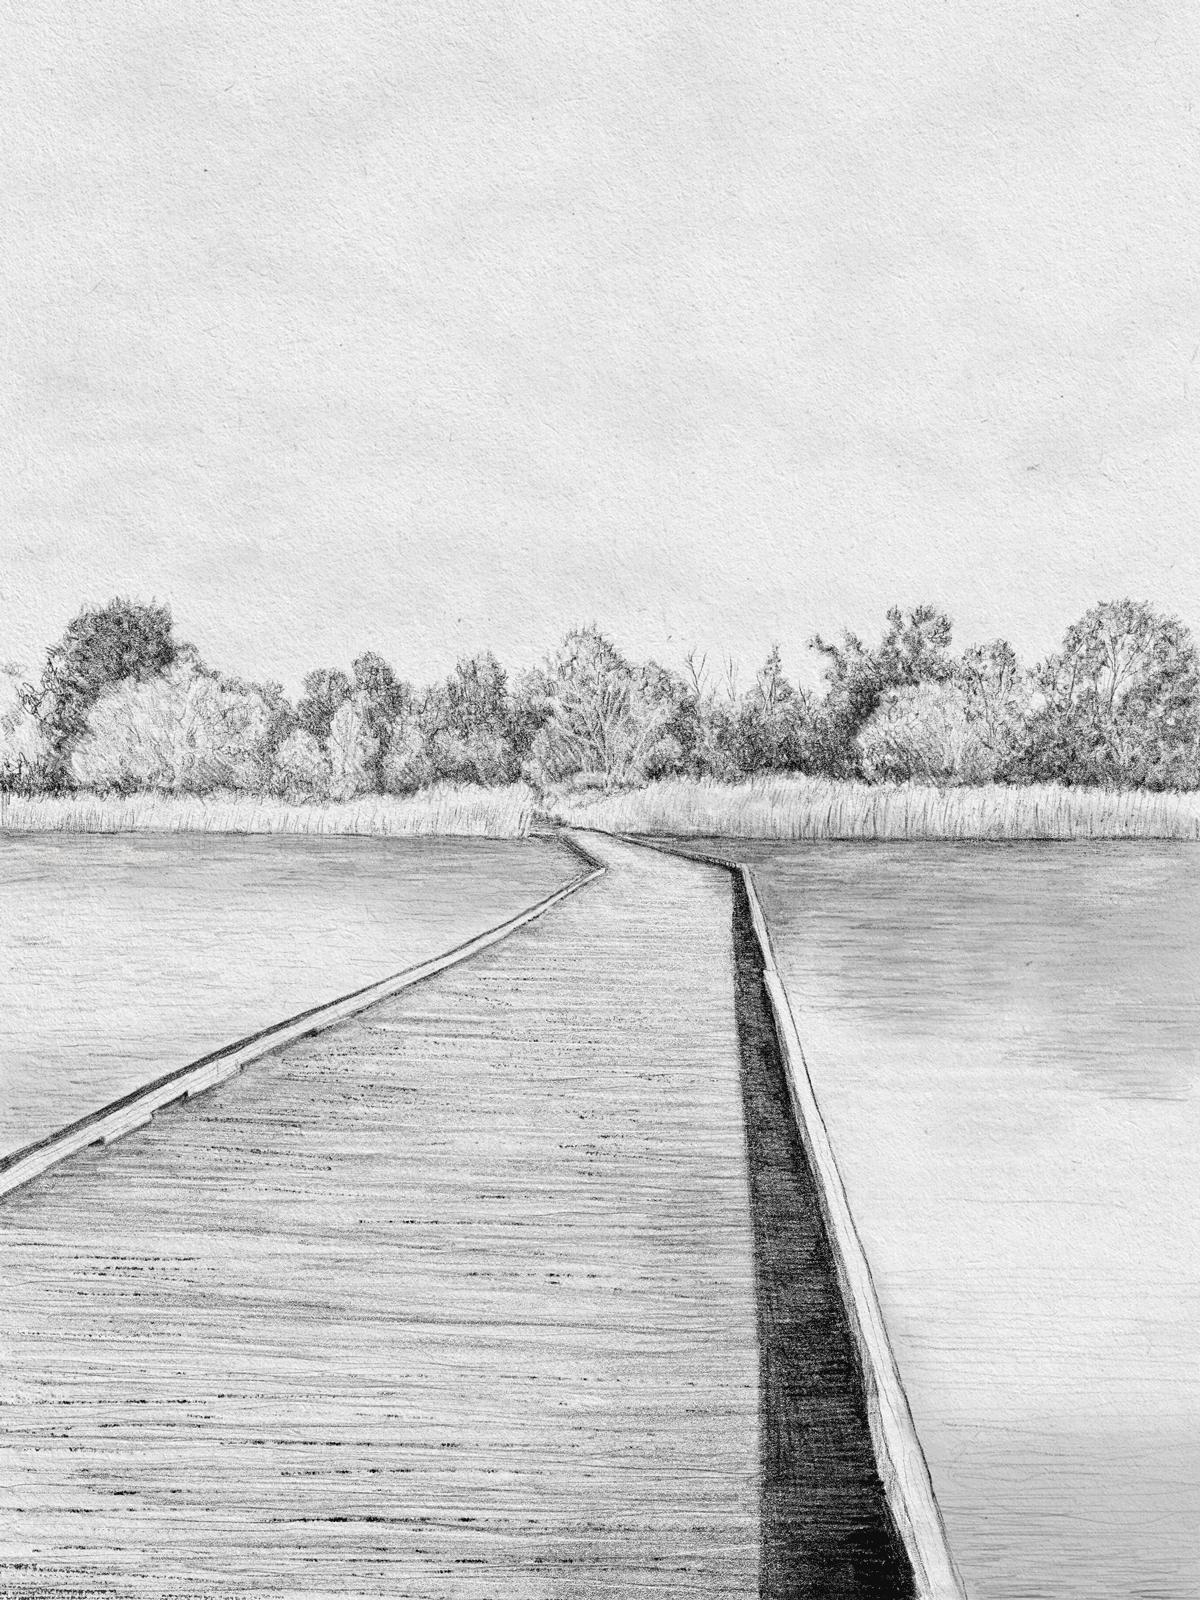 turtle-rock-pond-bridge-drawing